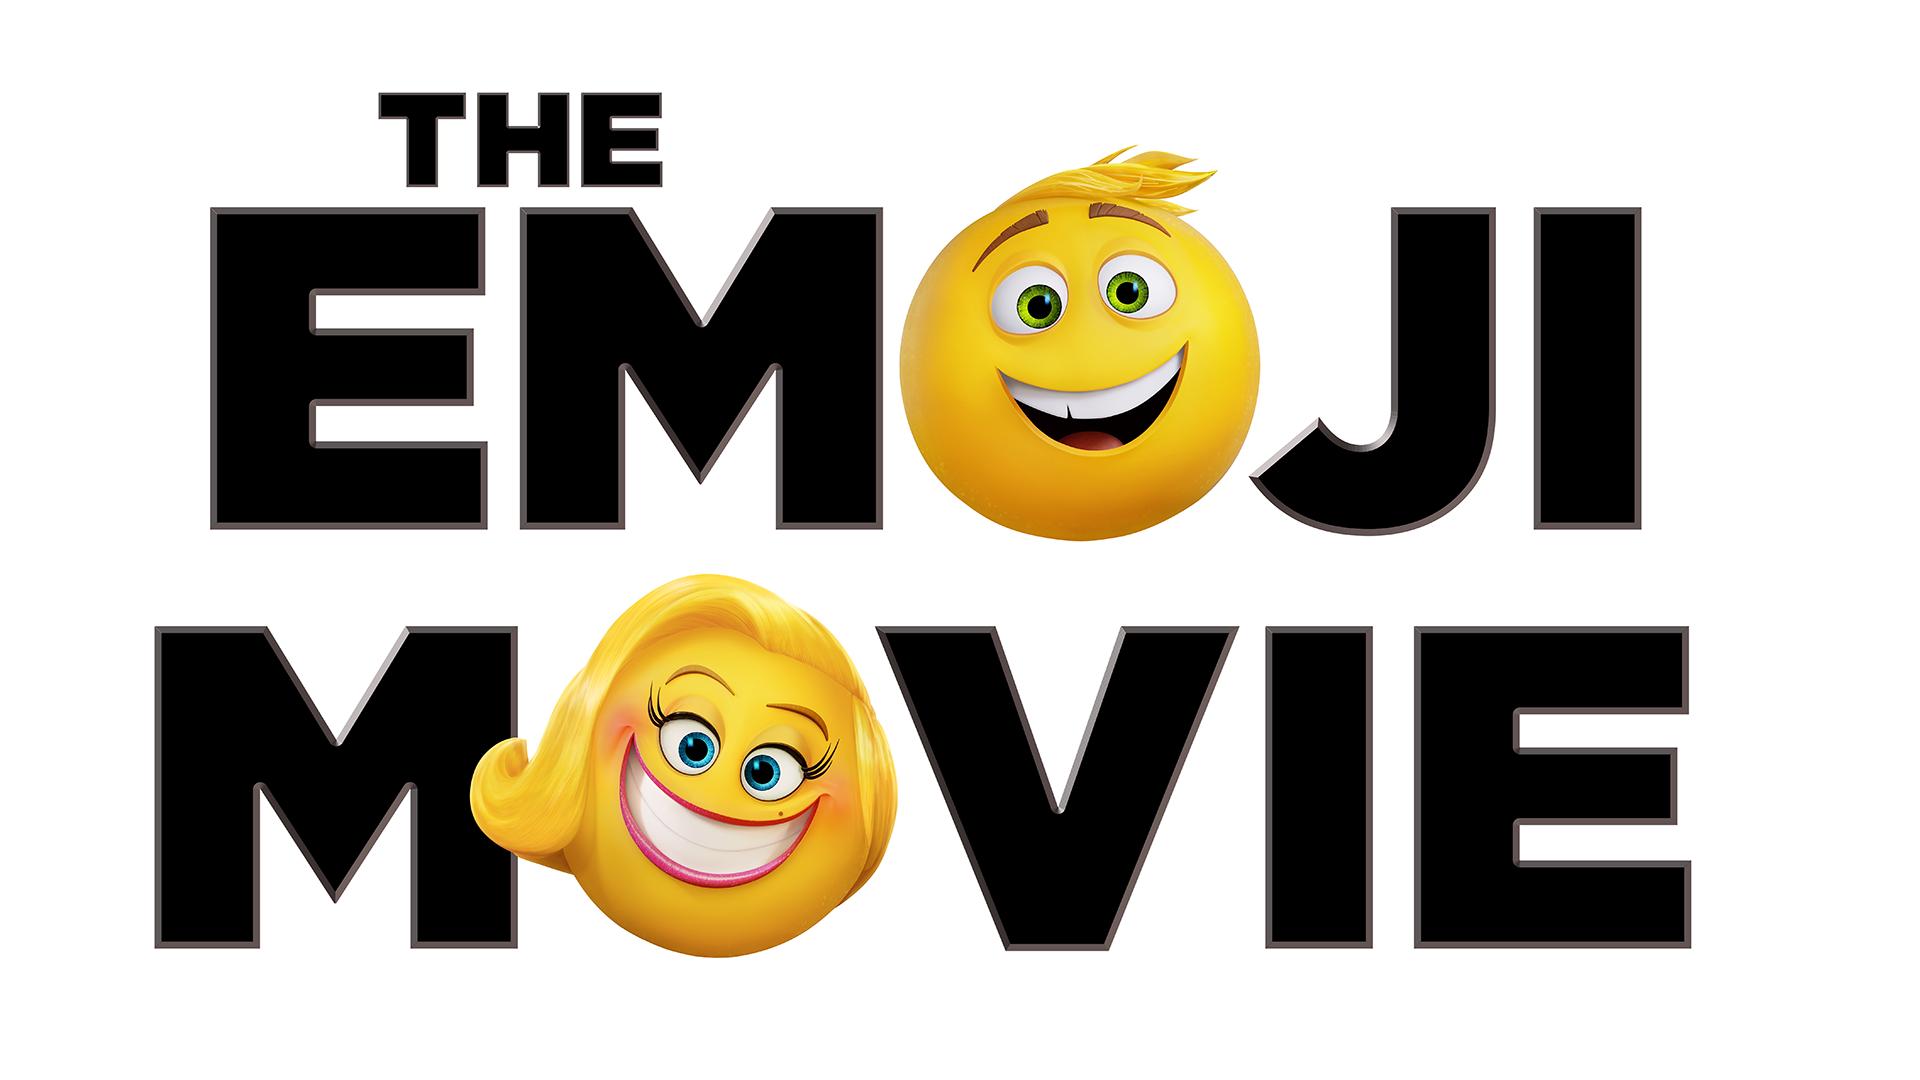 Emojis For Emoji Movie Wallpaper wwwemojiloveus 1920x1080